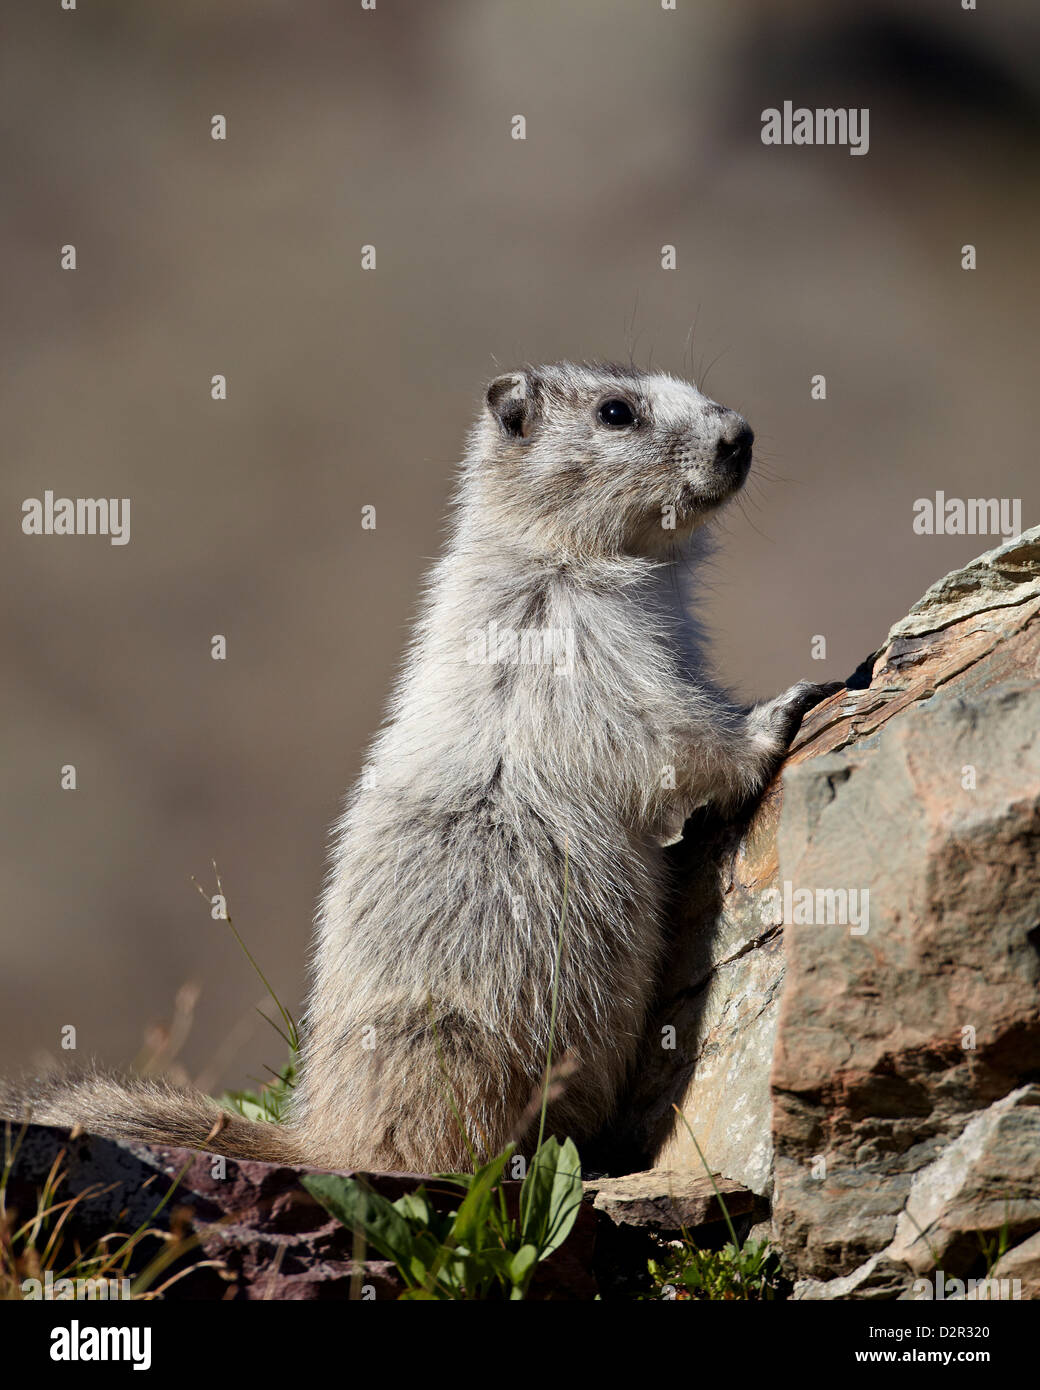 Hoary marmot (Marmota caligata), Glacier National Park, Montana, United States of America, North America - Stock Image